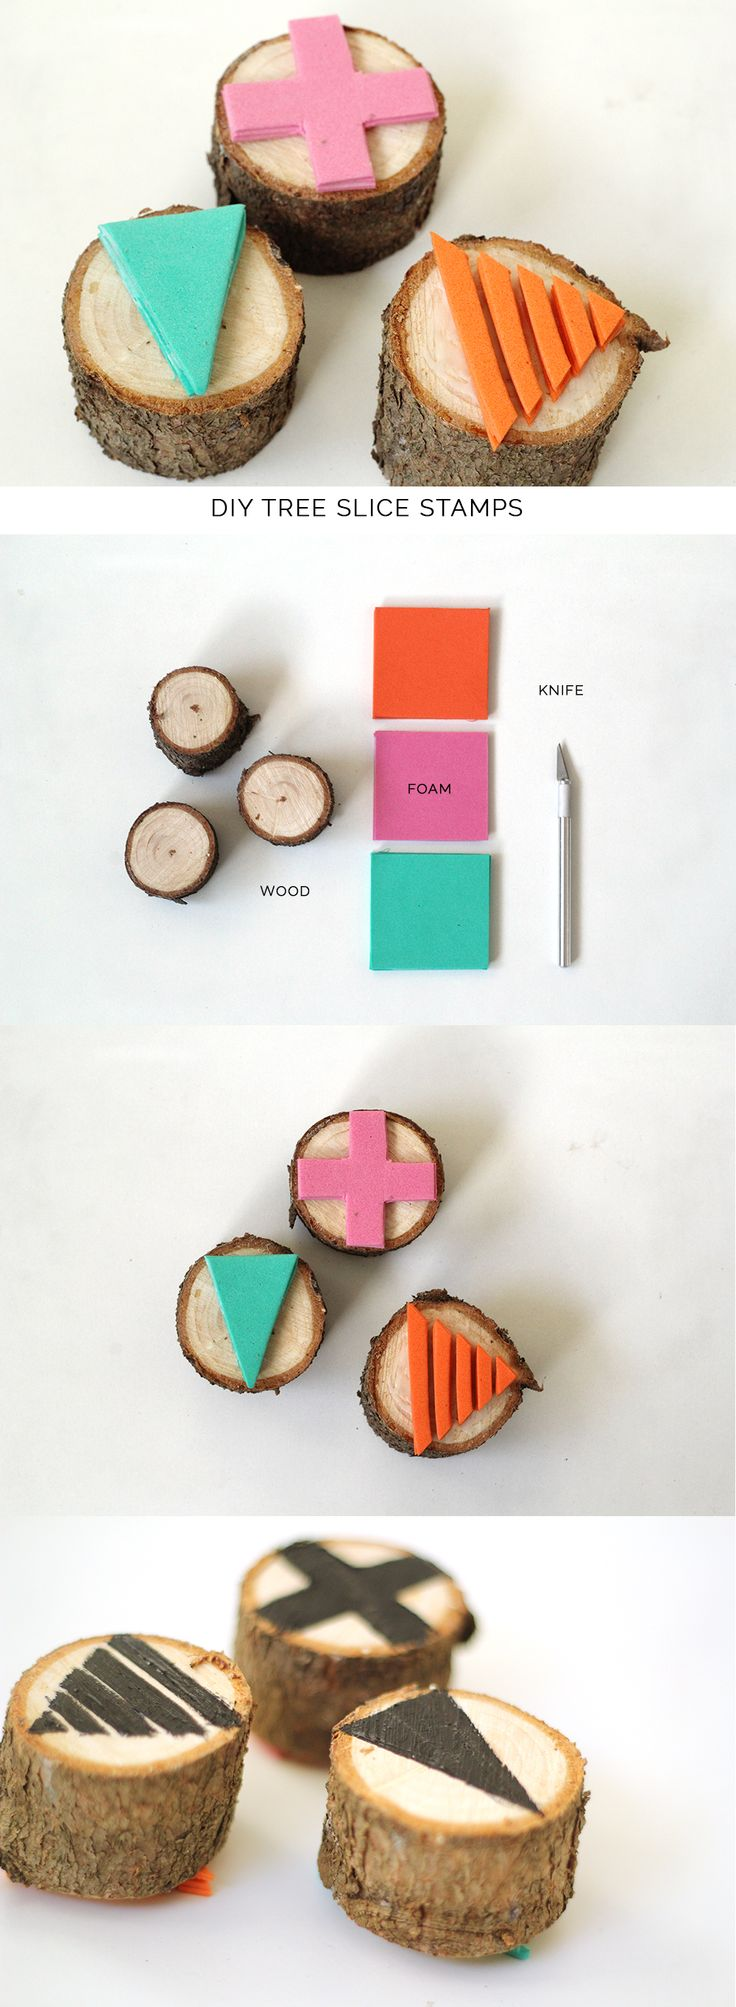 DIY tree slice stamp